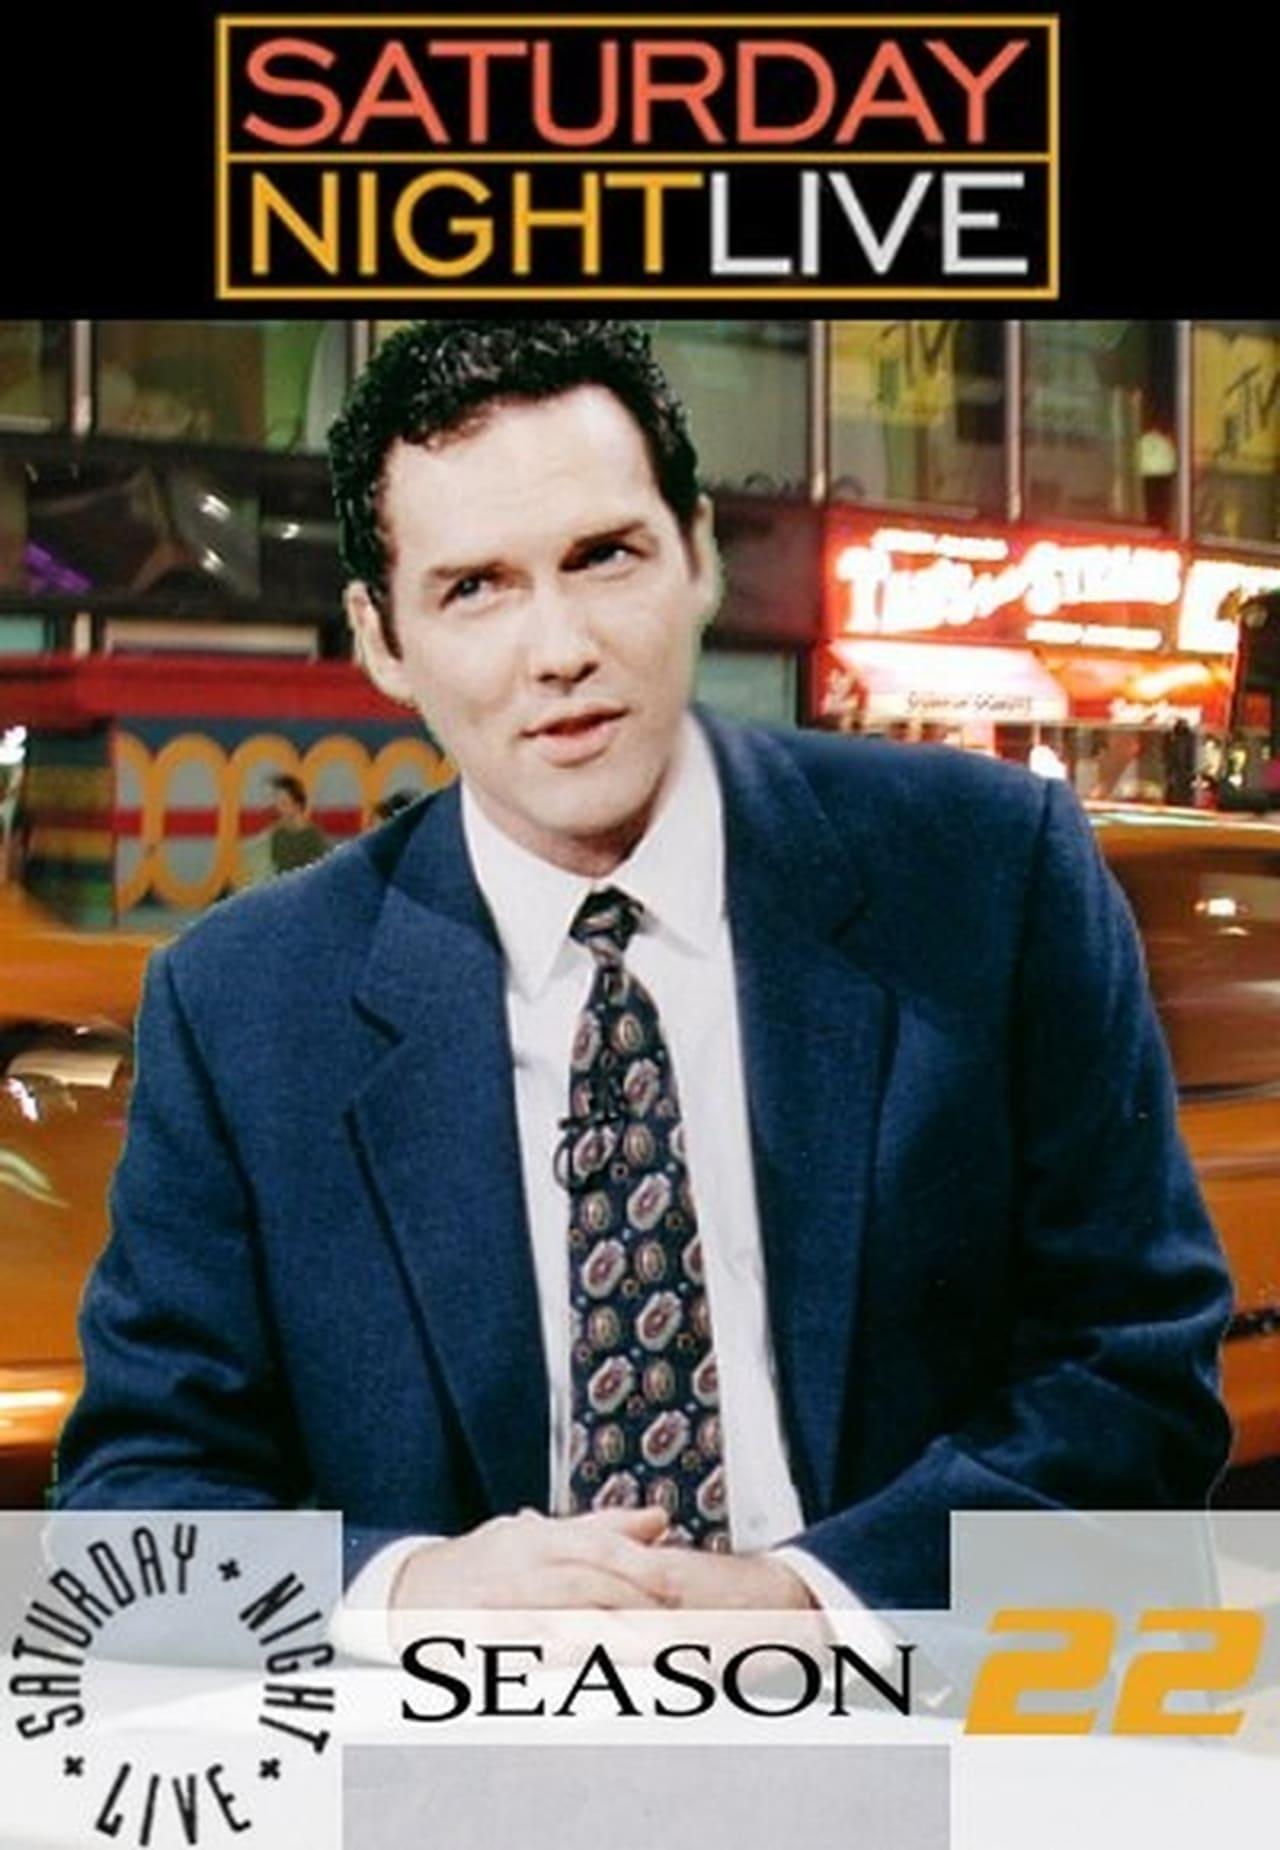 Saturday Night Live Season 22